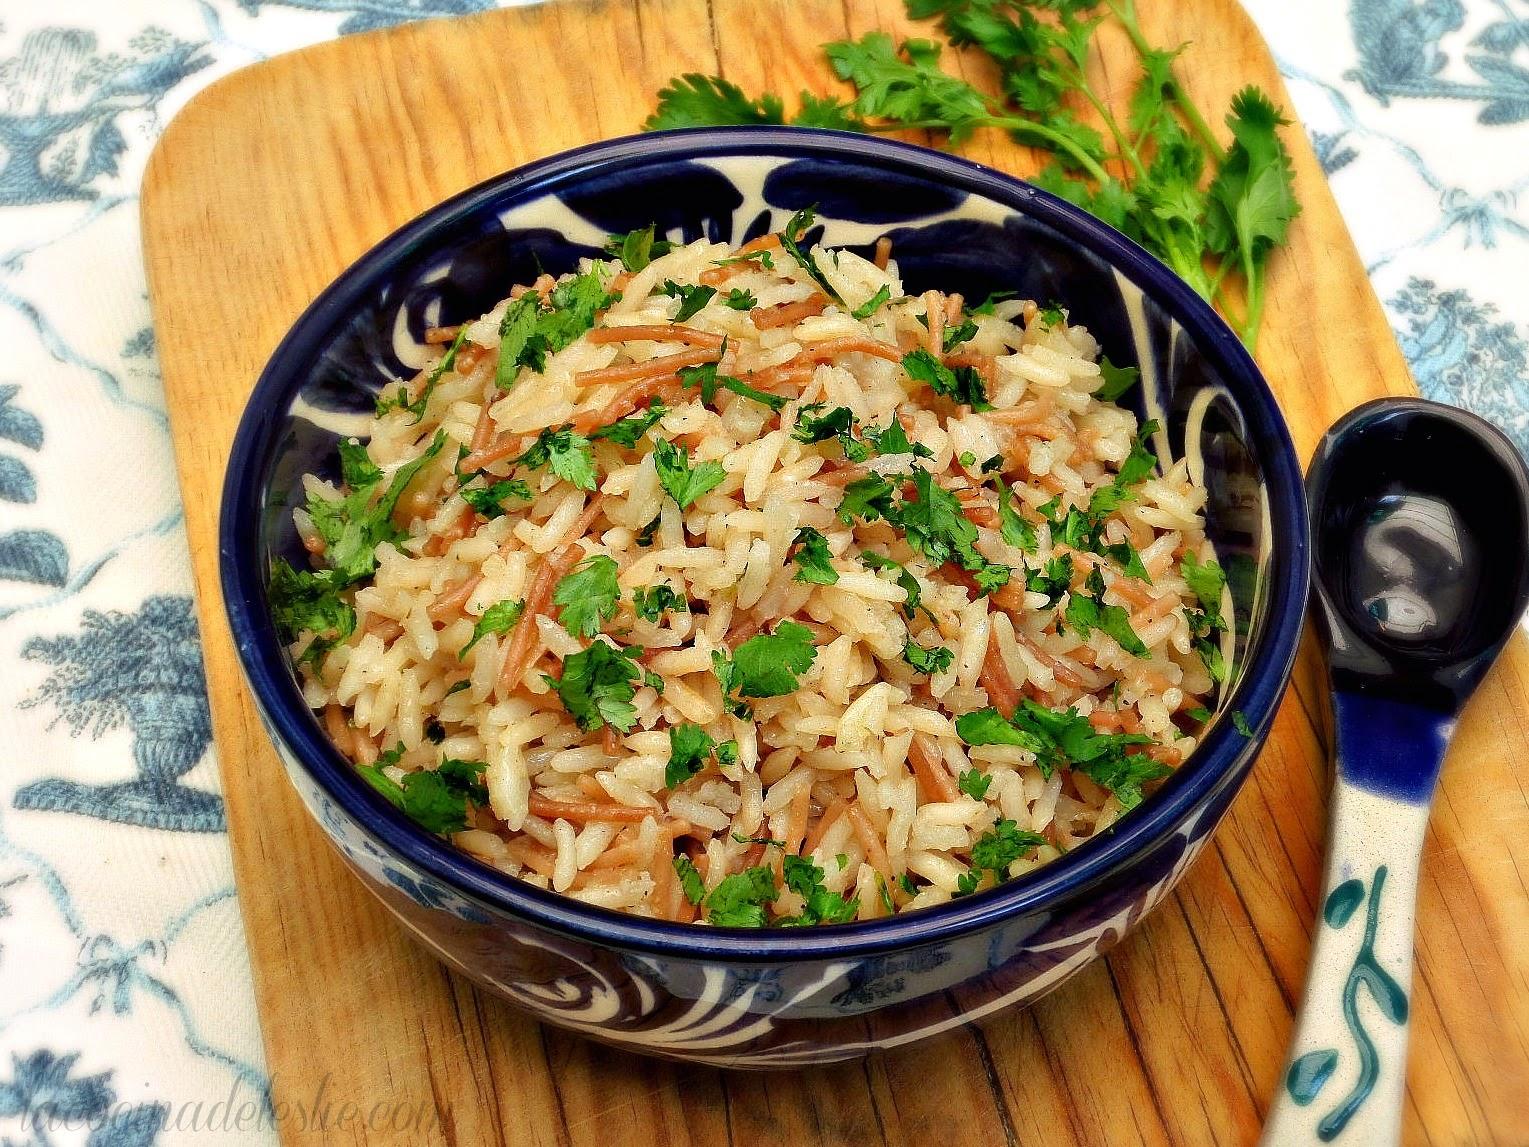 Recete de arroz pilaf - lacocinadeleslie.com